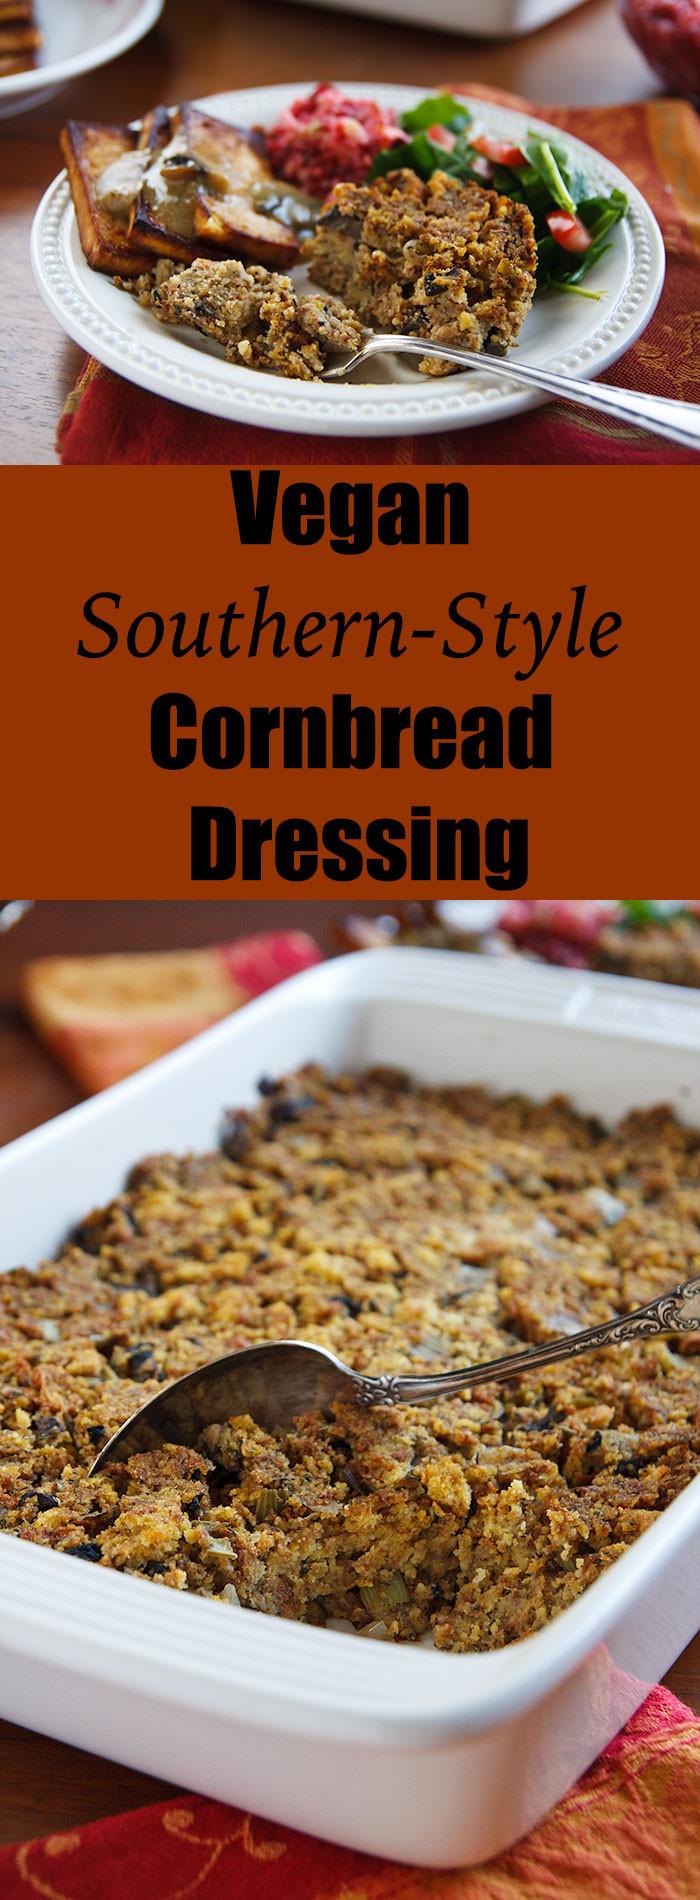 Southern Style Cornbread Dressing  Vegan Southern Style Cornbread Dressing